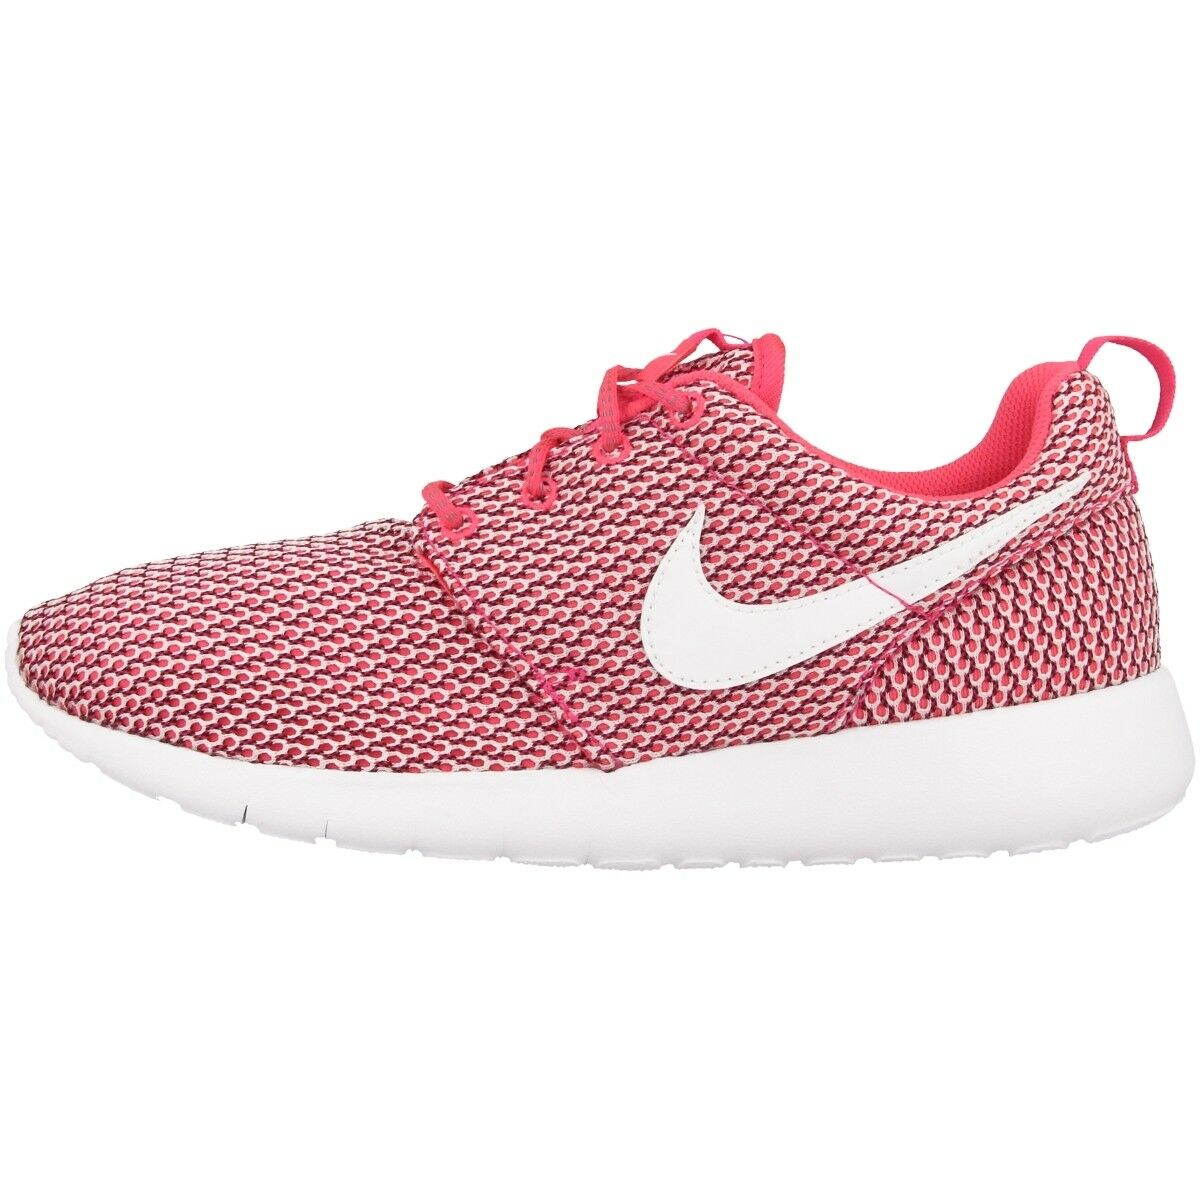 Nike Roshe One GS Schuhe Sneaker Rosheone 599729-615 pink WEISS Rosherun Thea 599729-615 Rosheone 16ac91